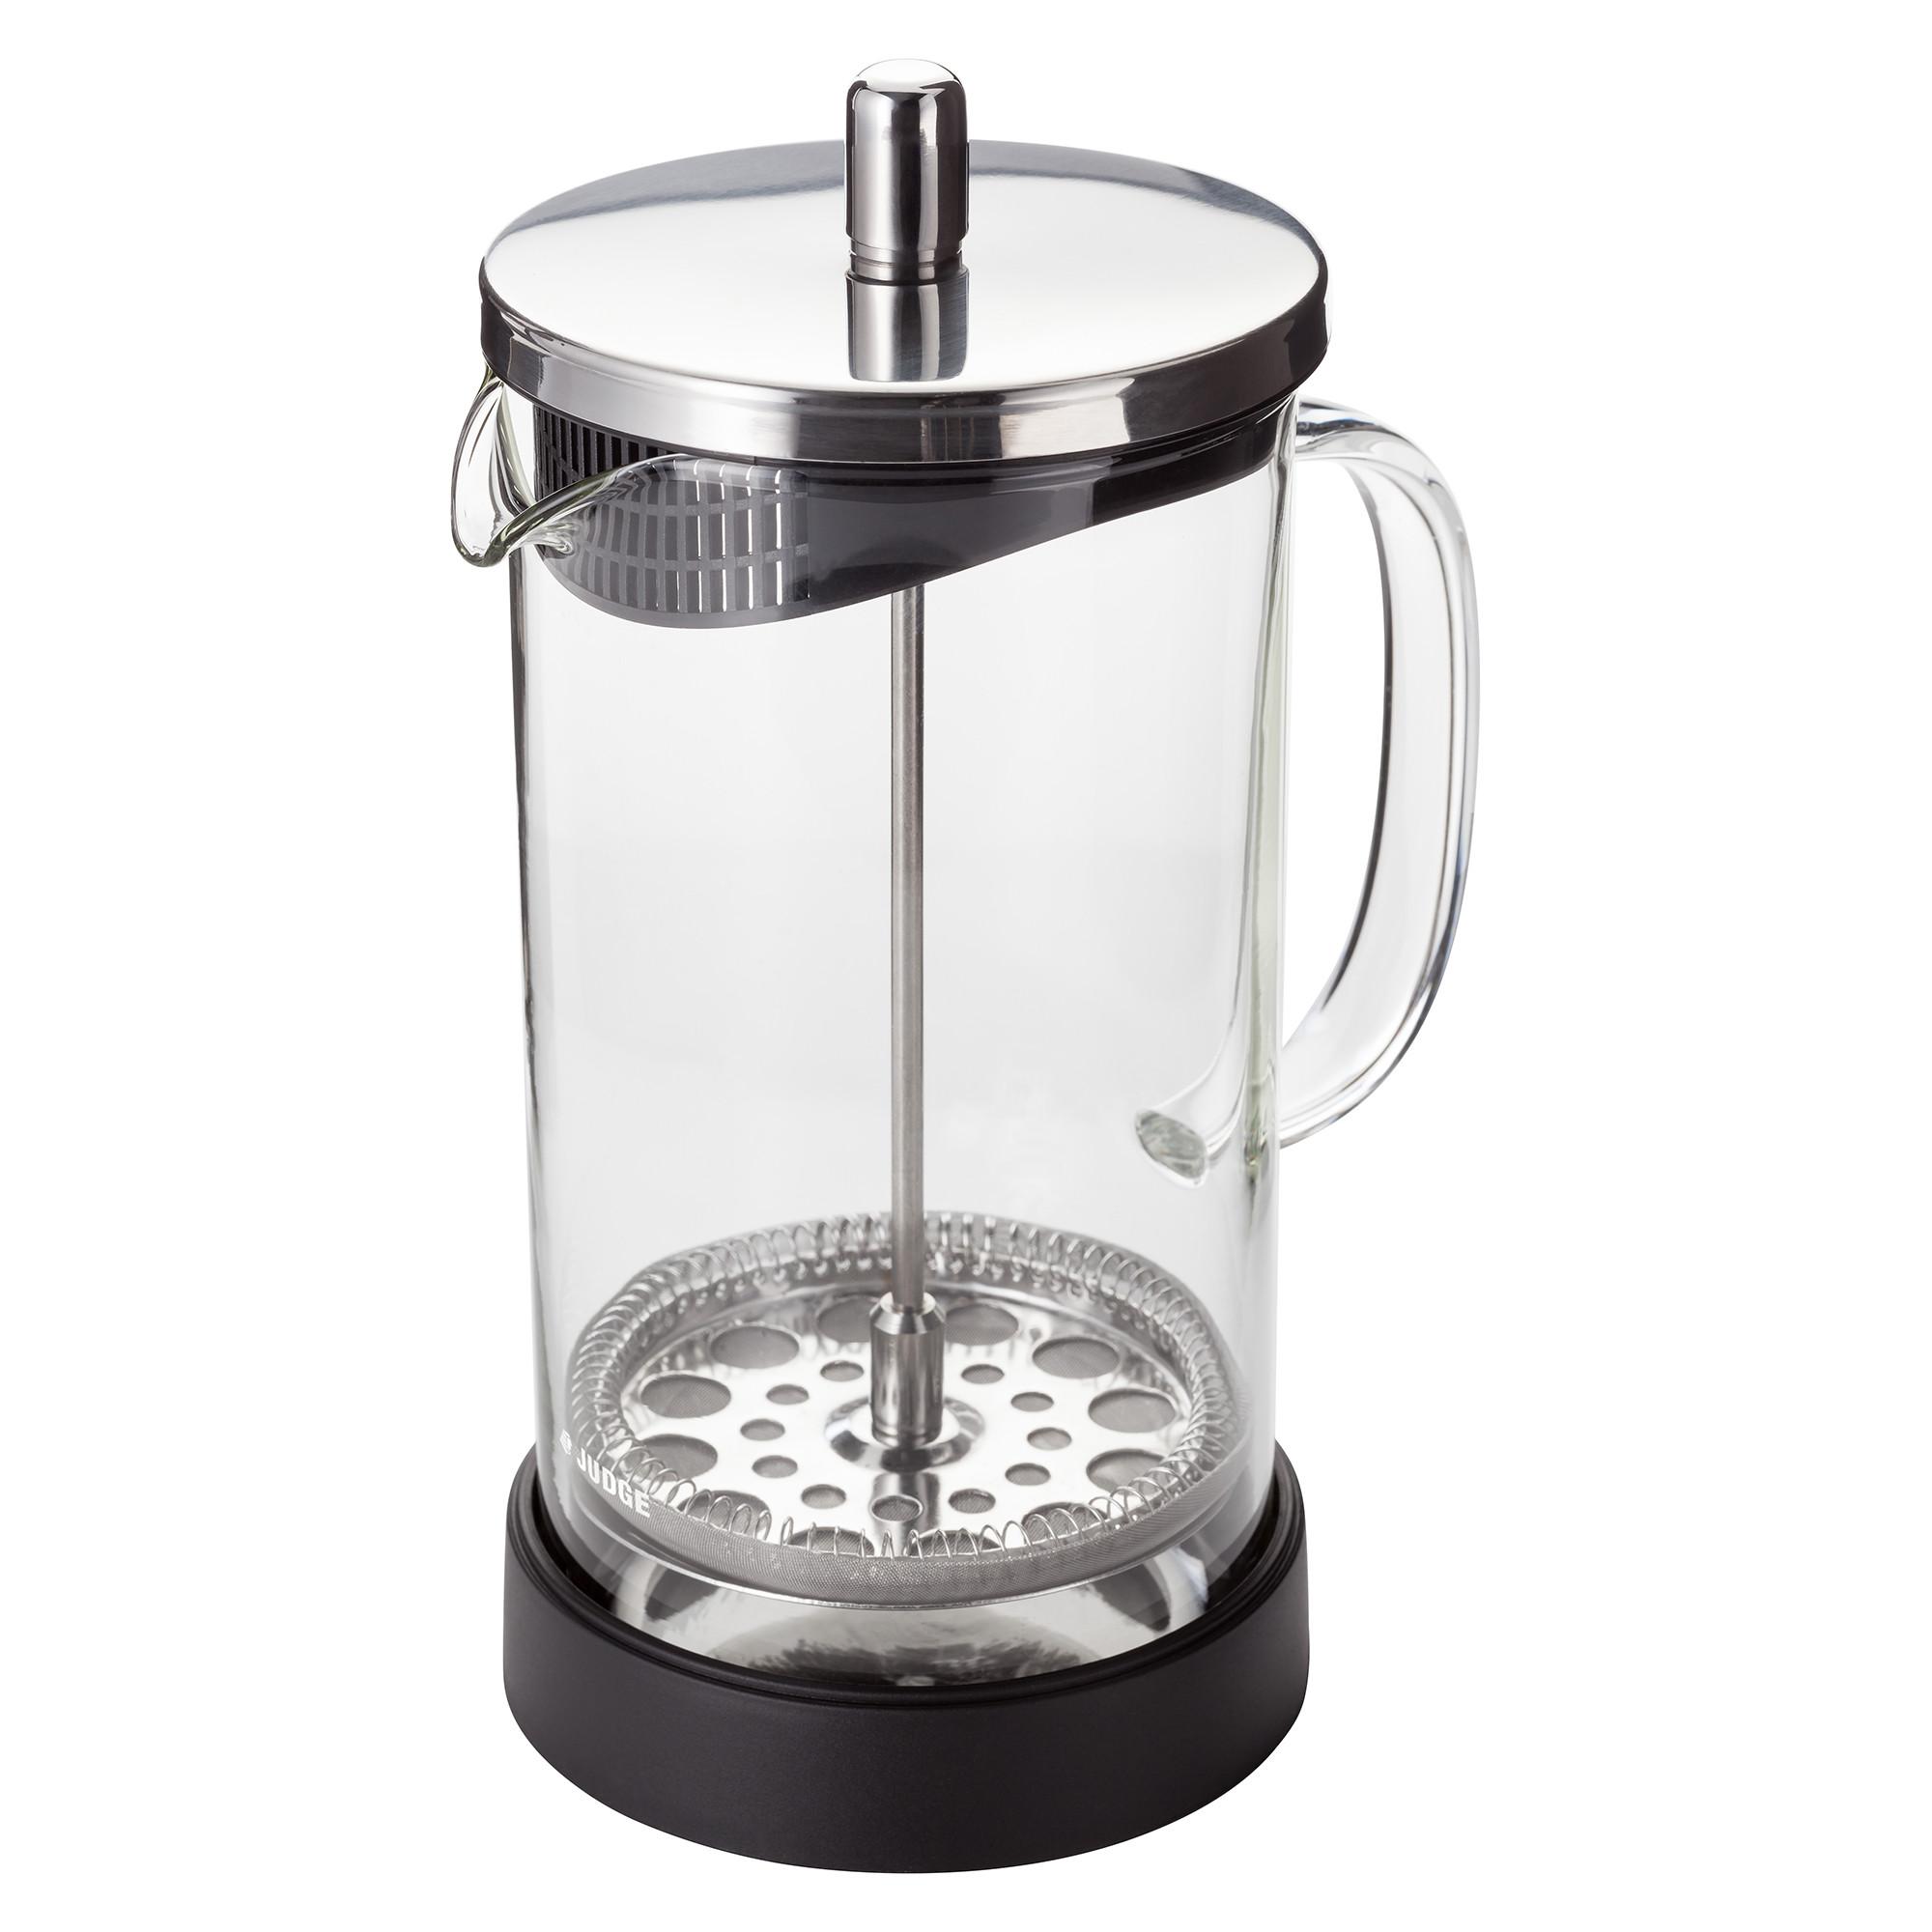 Cafetiere stempelkande, glas - 8 kopper